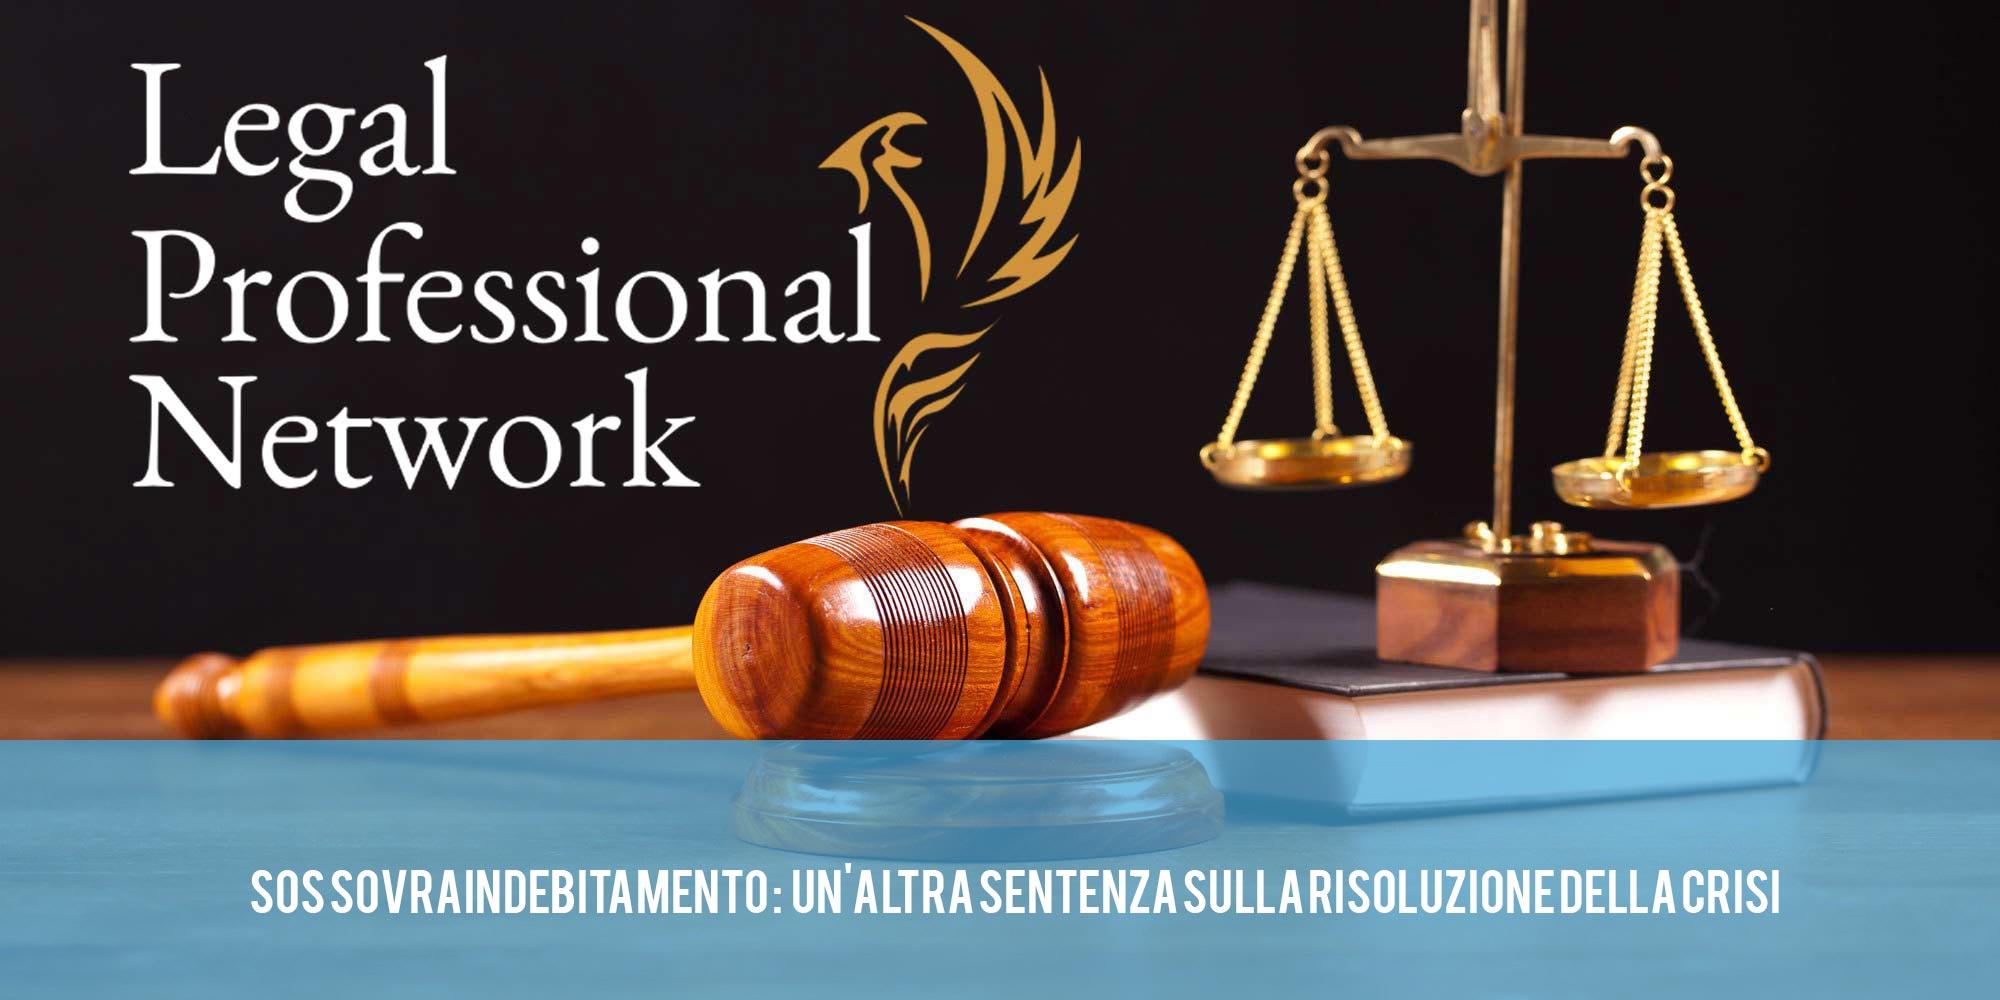 Sovraindebitamento sentenza salva imprenditore legge anti suicidi legge 2 sovraindebitamento procedure